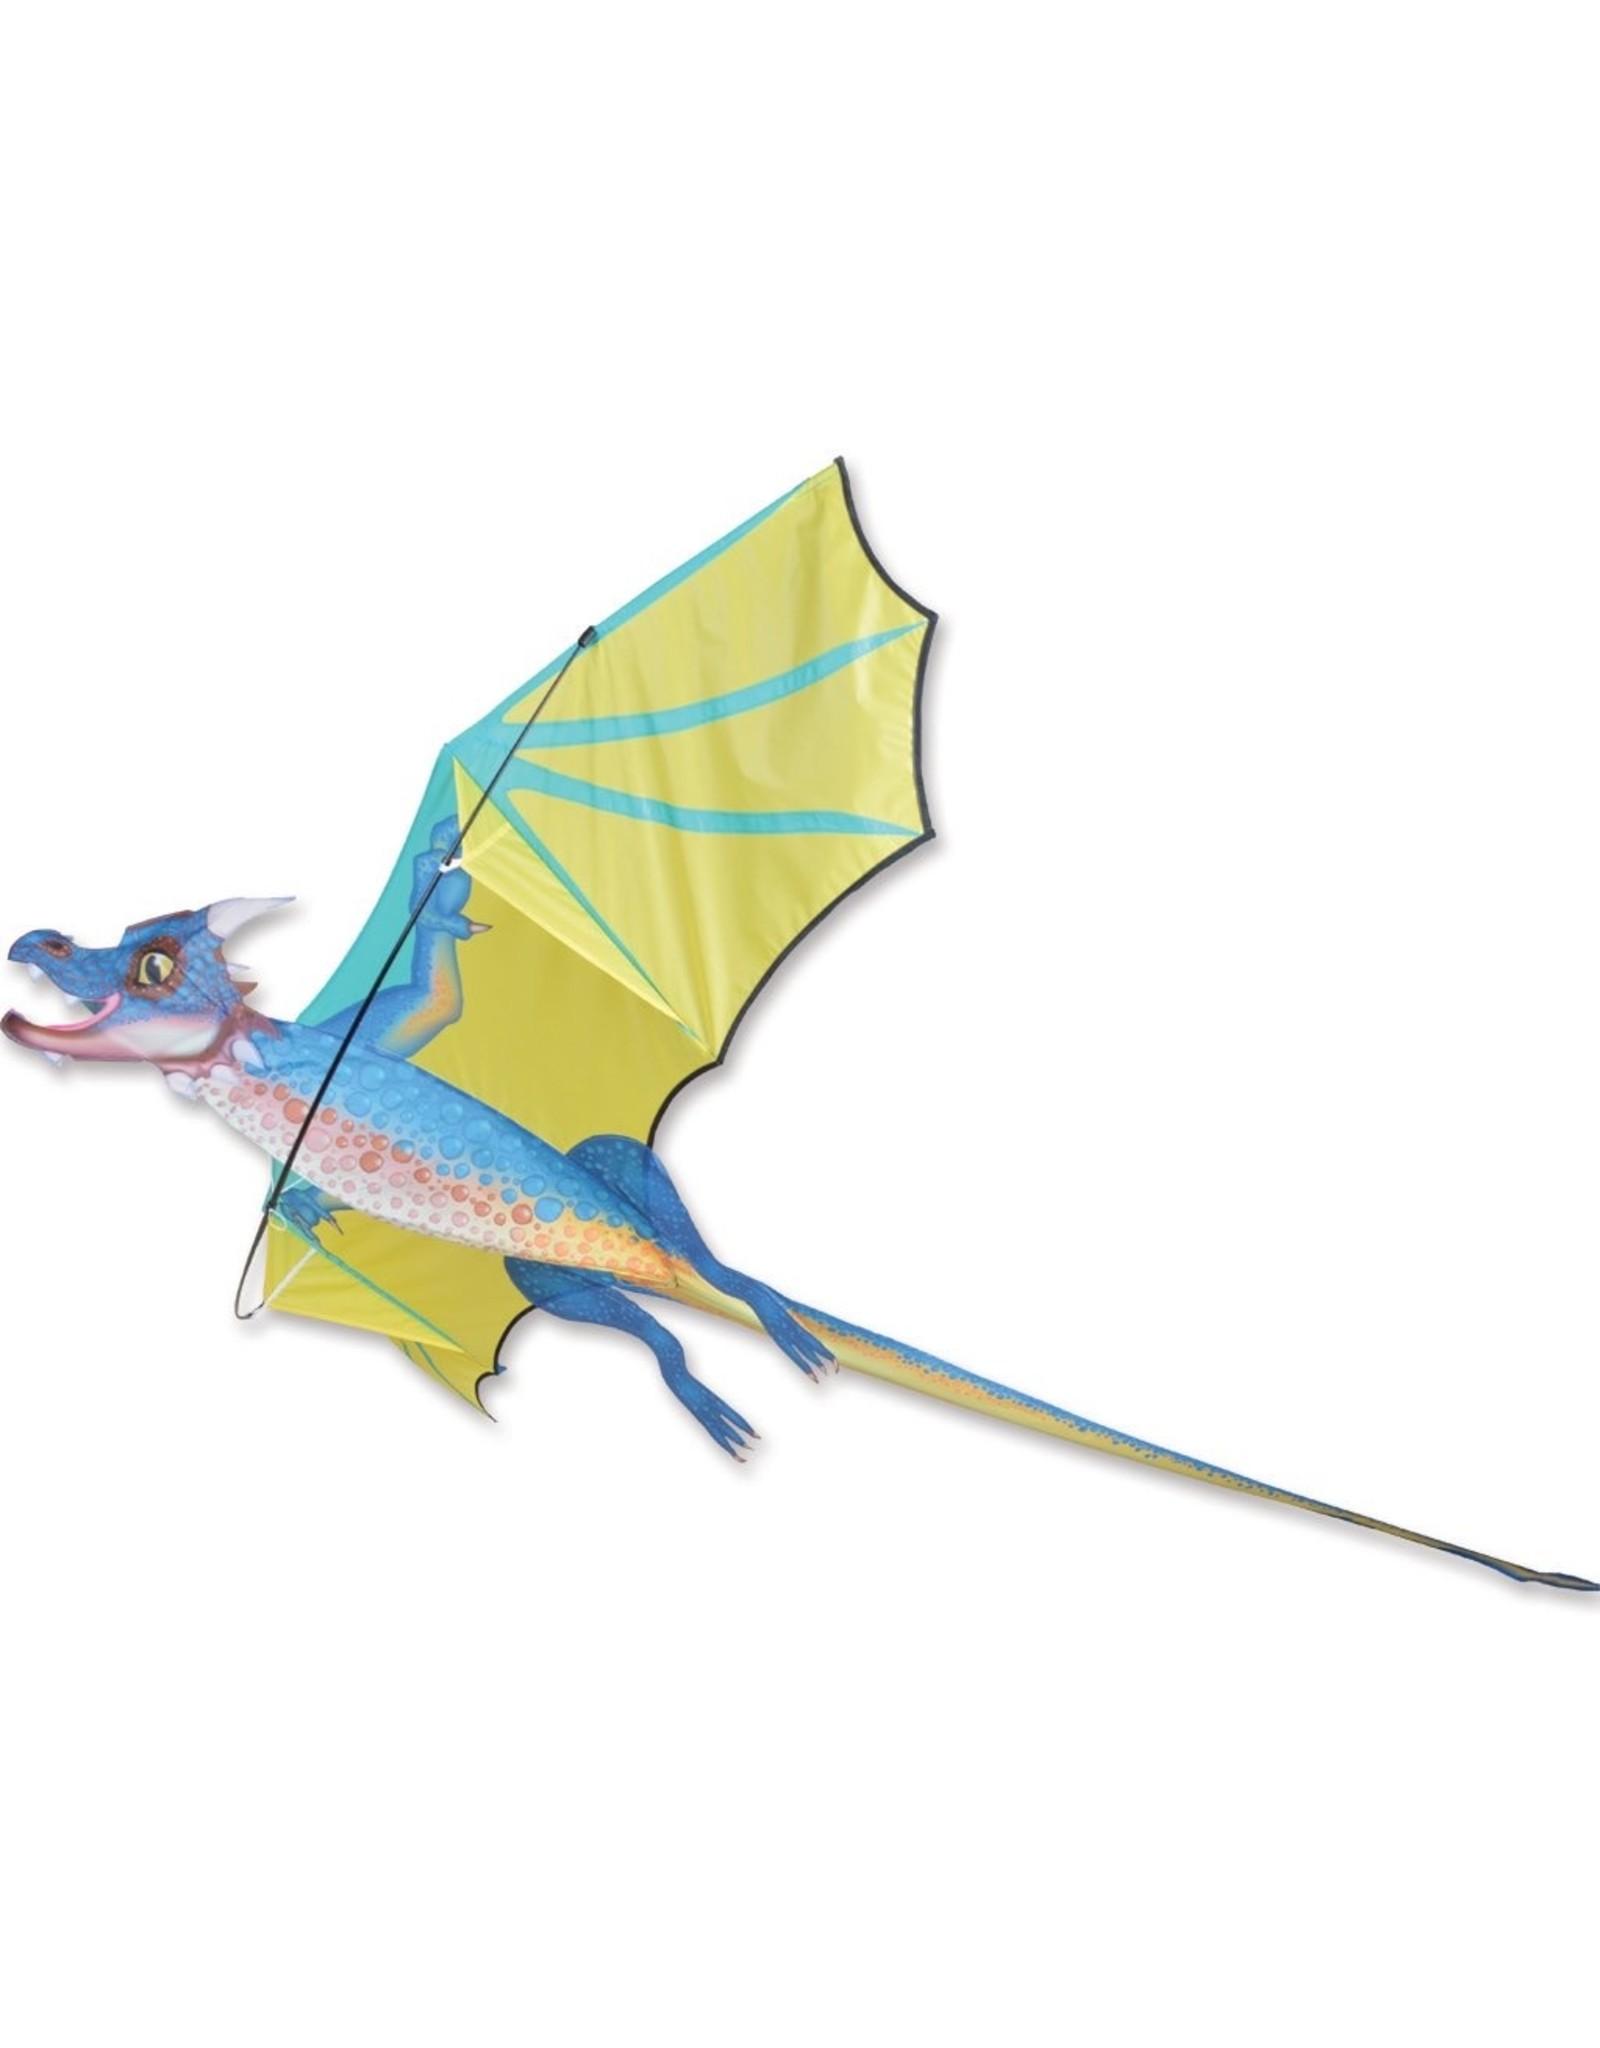 Premier Kites 3D Stormcloud Dragon Kite